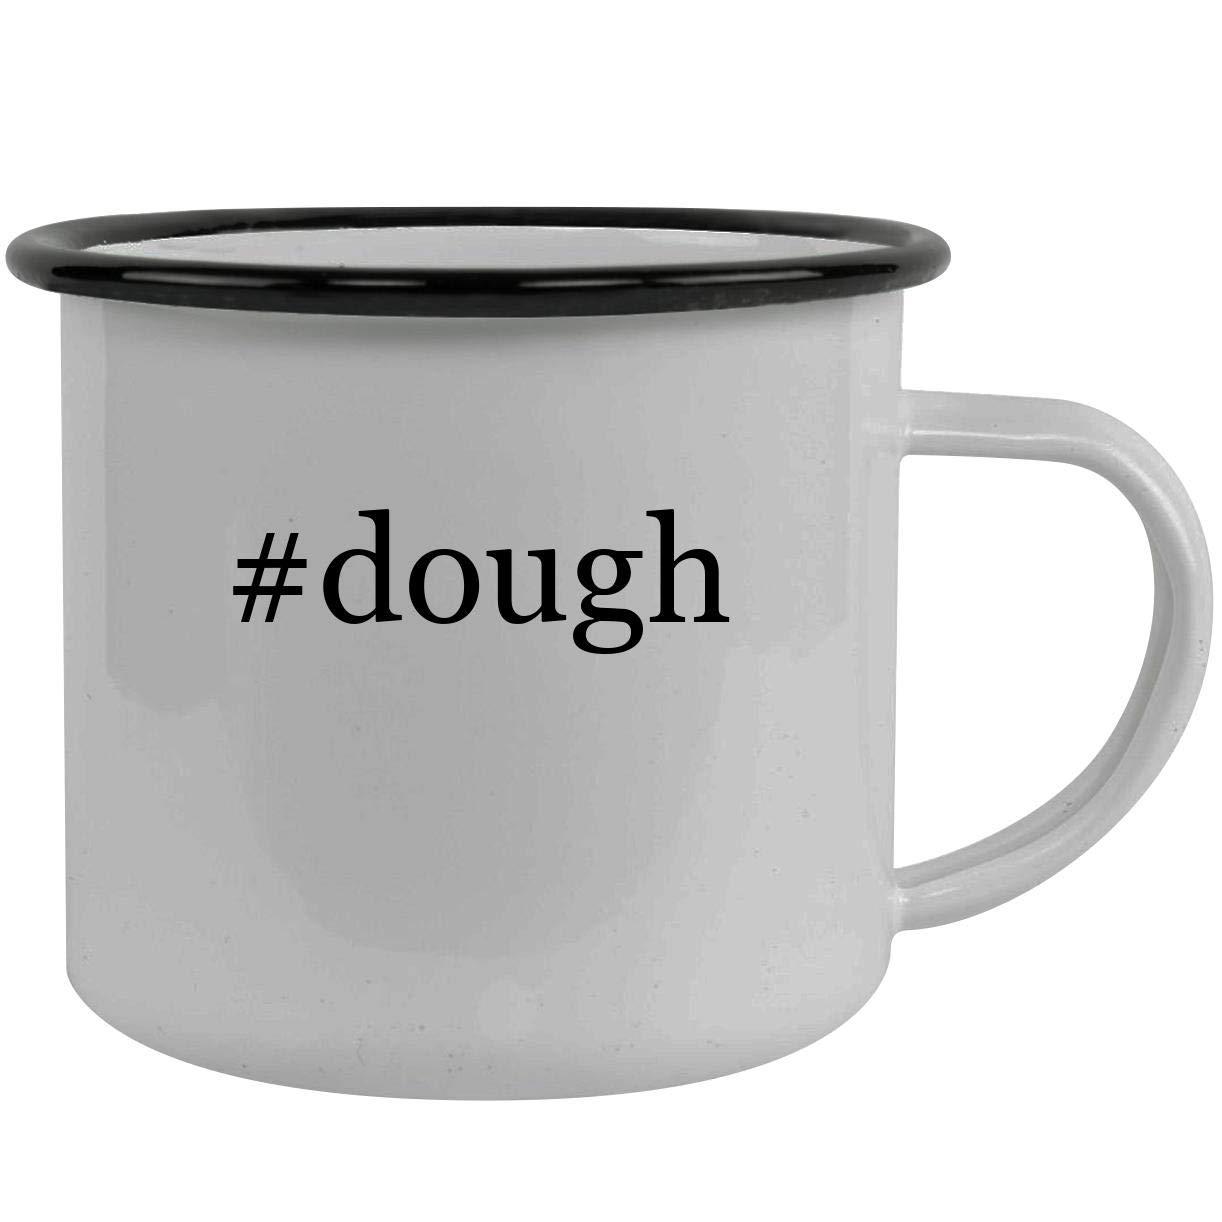 #dough - Stainless Steel Hashtag 12oz Camping Mug